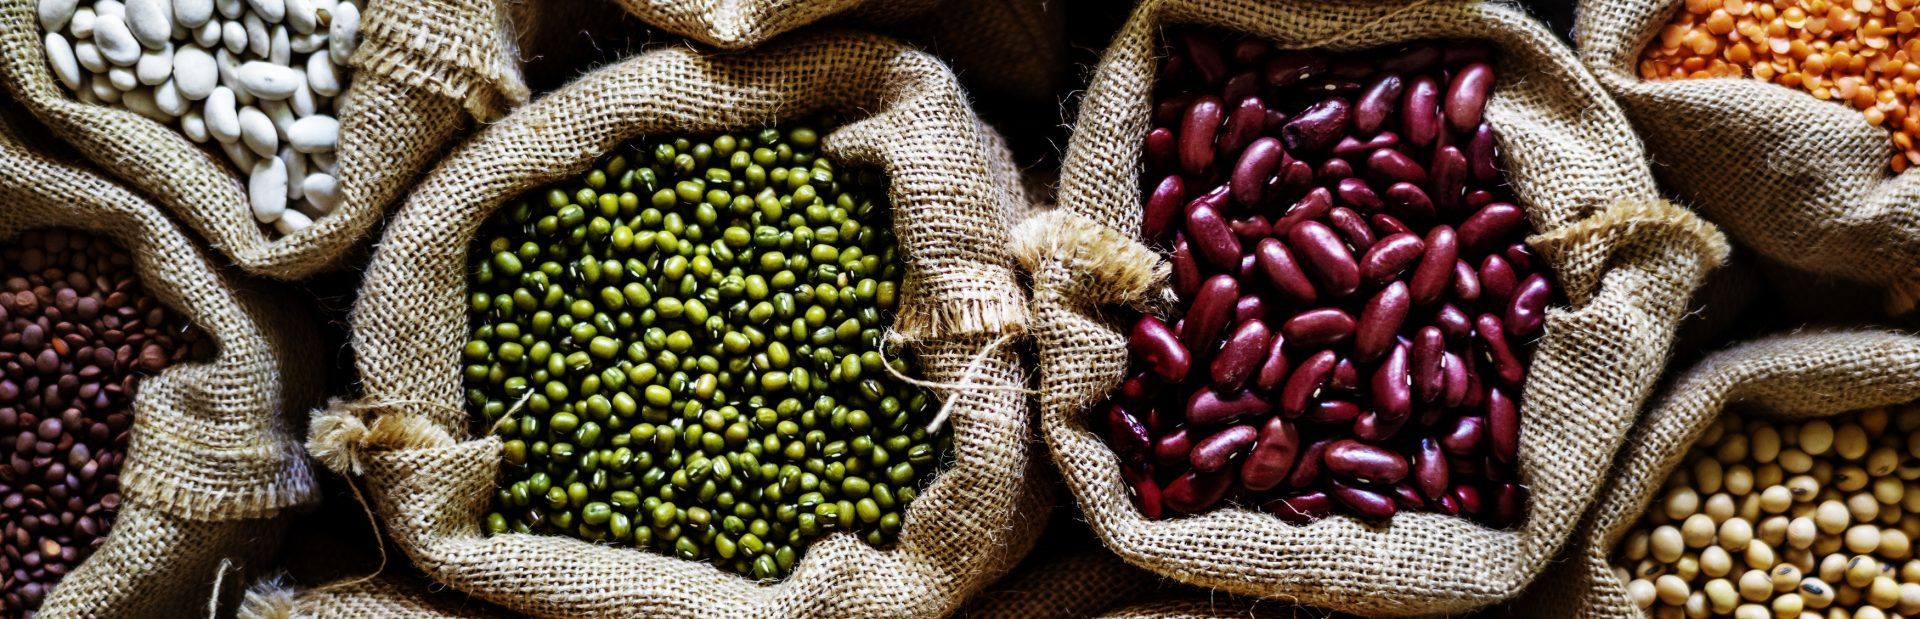 Beans are a lysine-rich food